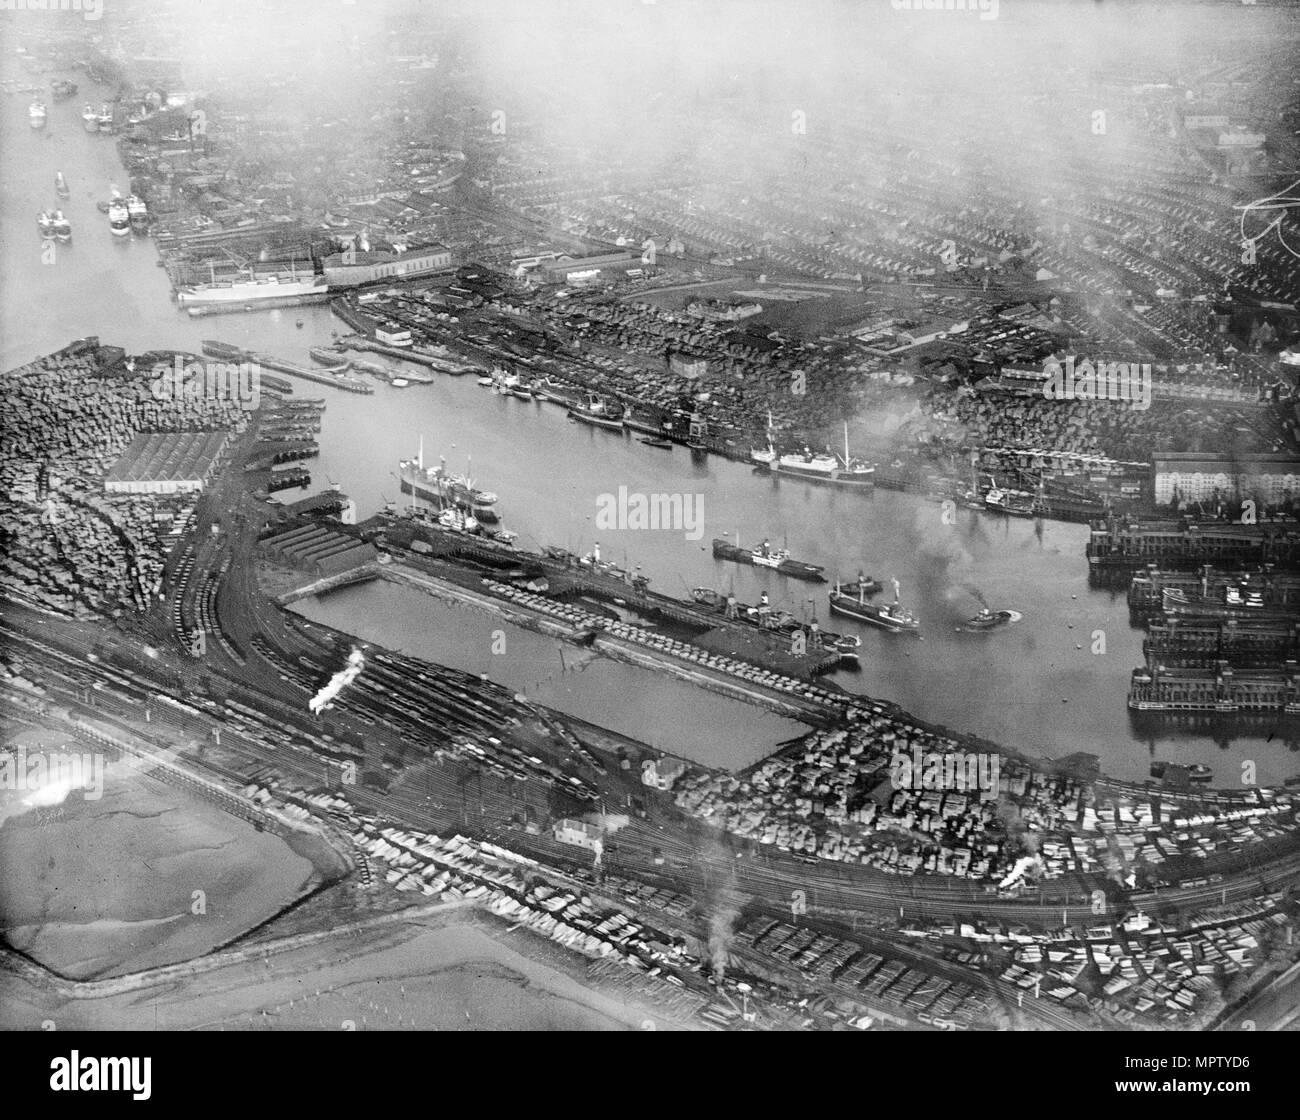 Tyne Dock, South Shields, South Tyneside, 1927. Artist: Aerofilms. - Stock Image